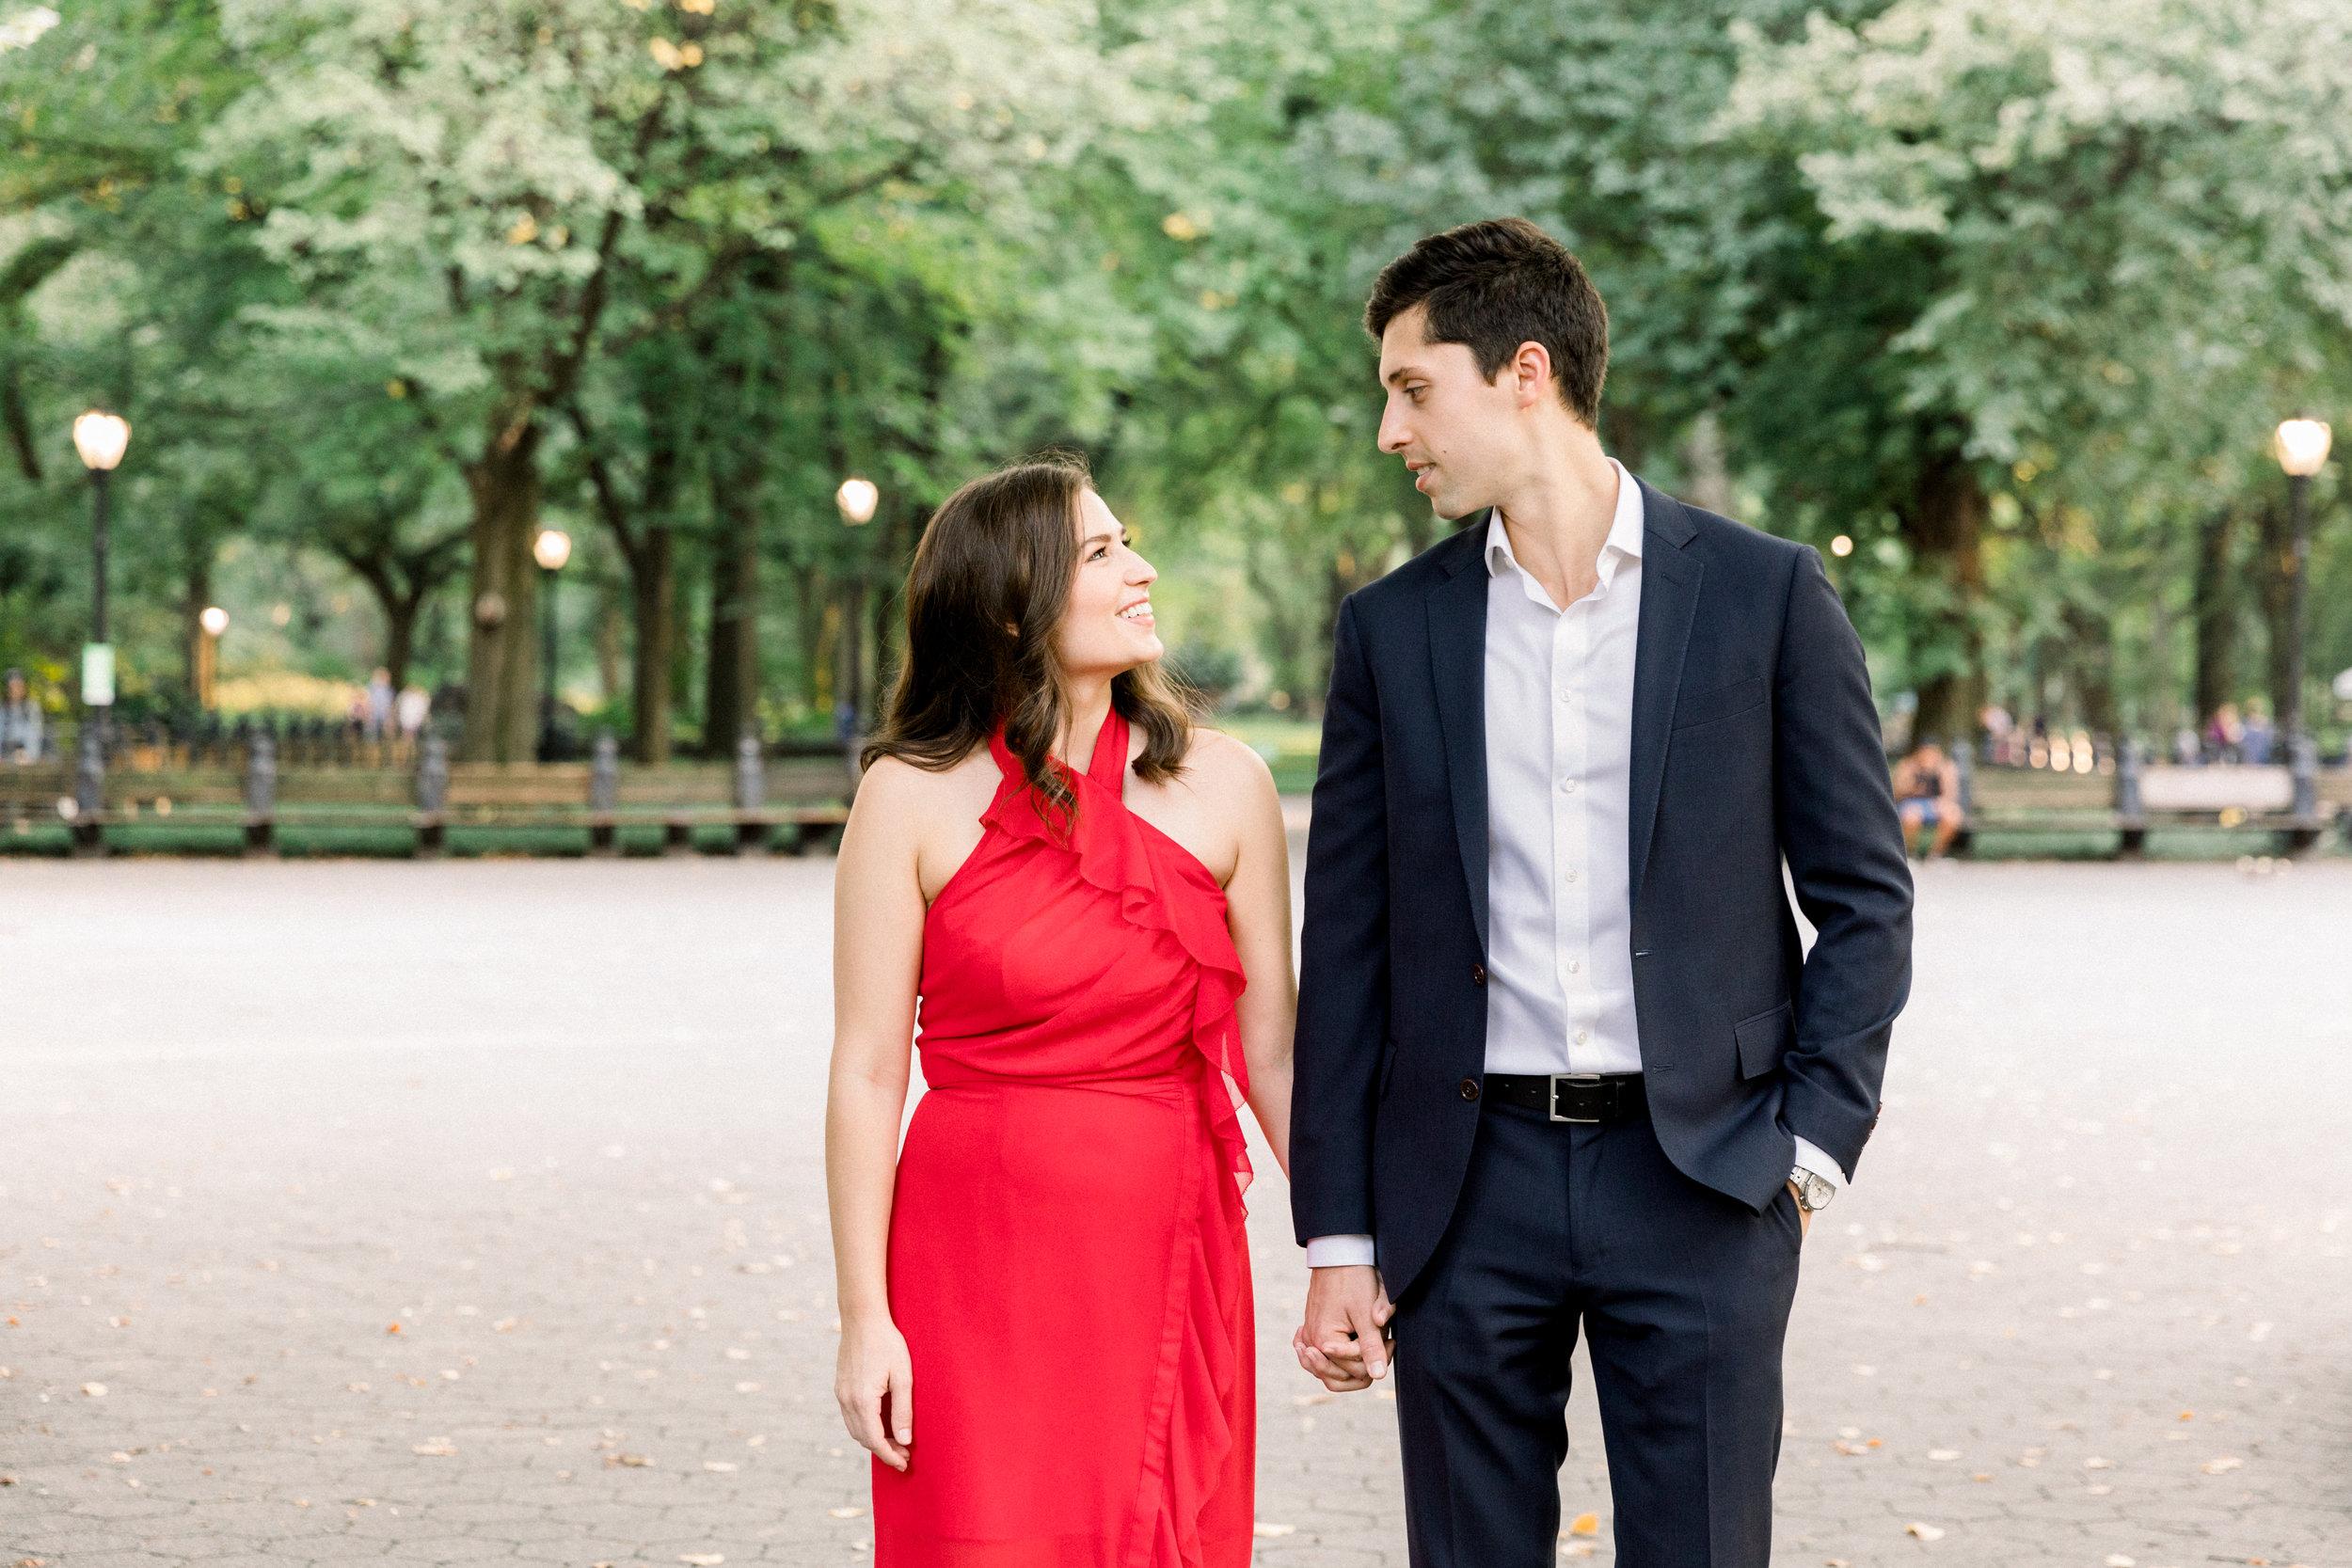 Hudson-Nichols-Central-Park-NYC-Fine-Art-Film-Engagement-Photography-09.jpg